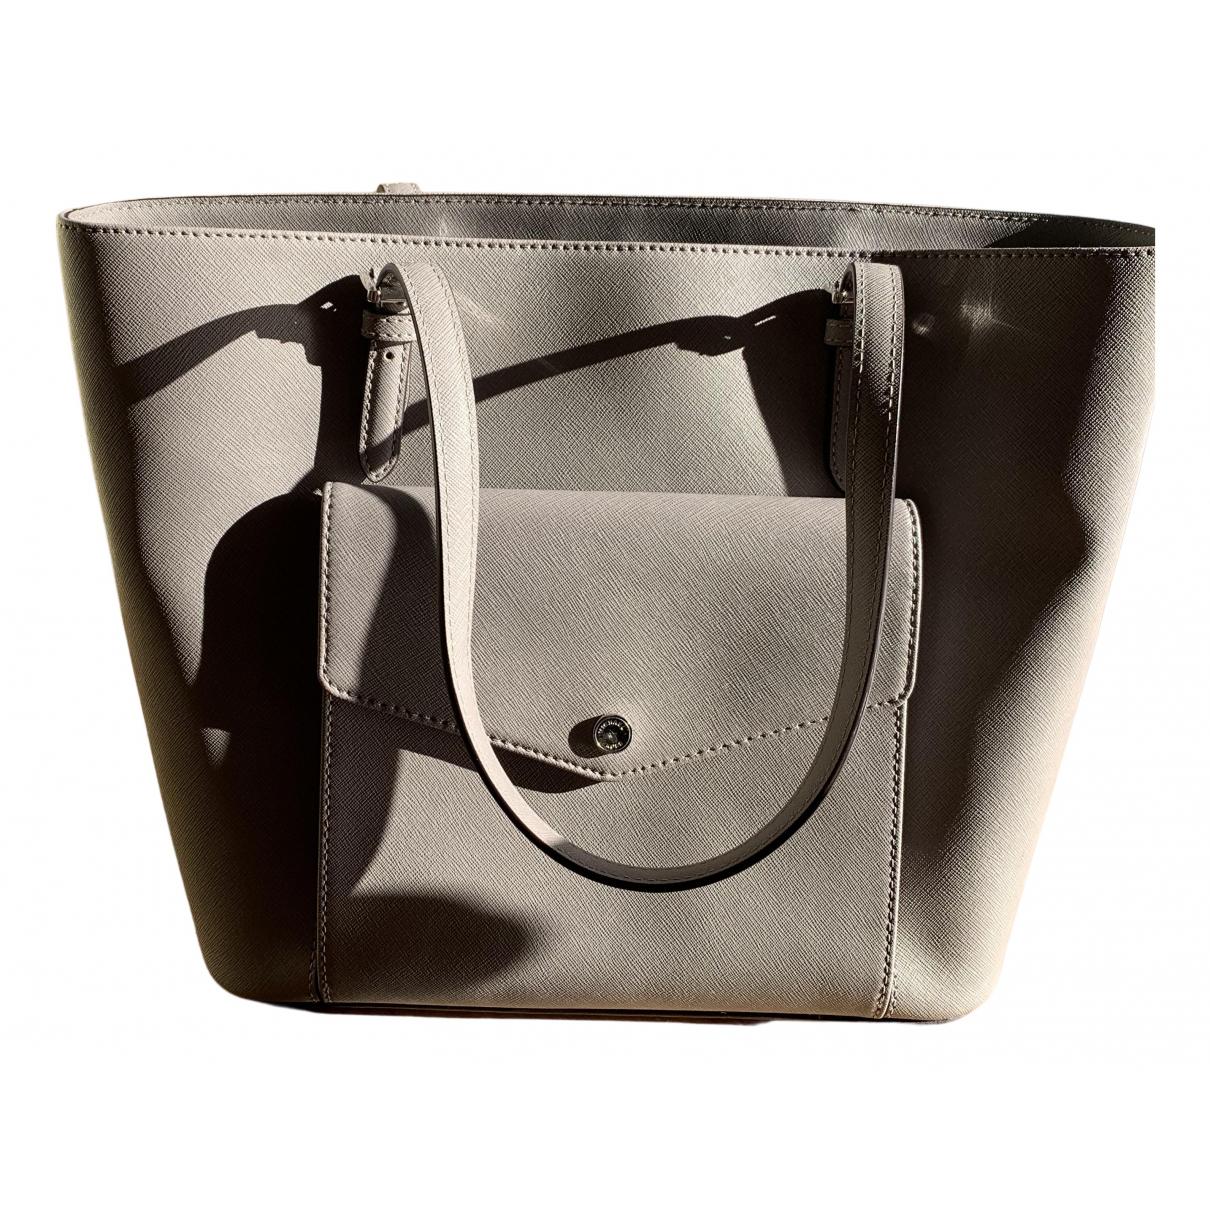 Michael Kors N Grey Leather handbag for Women N